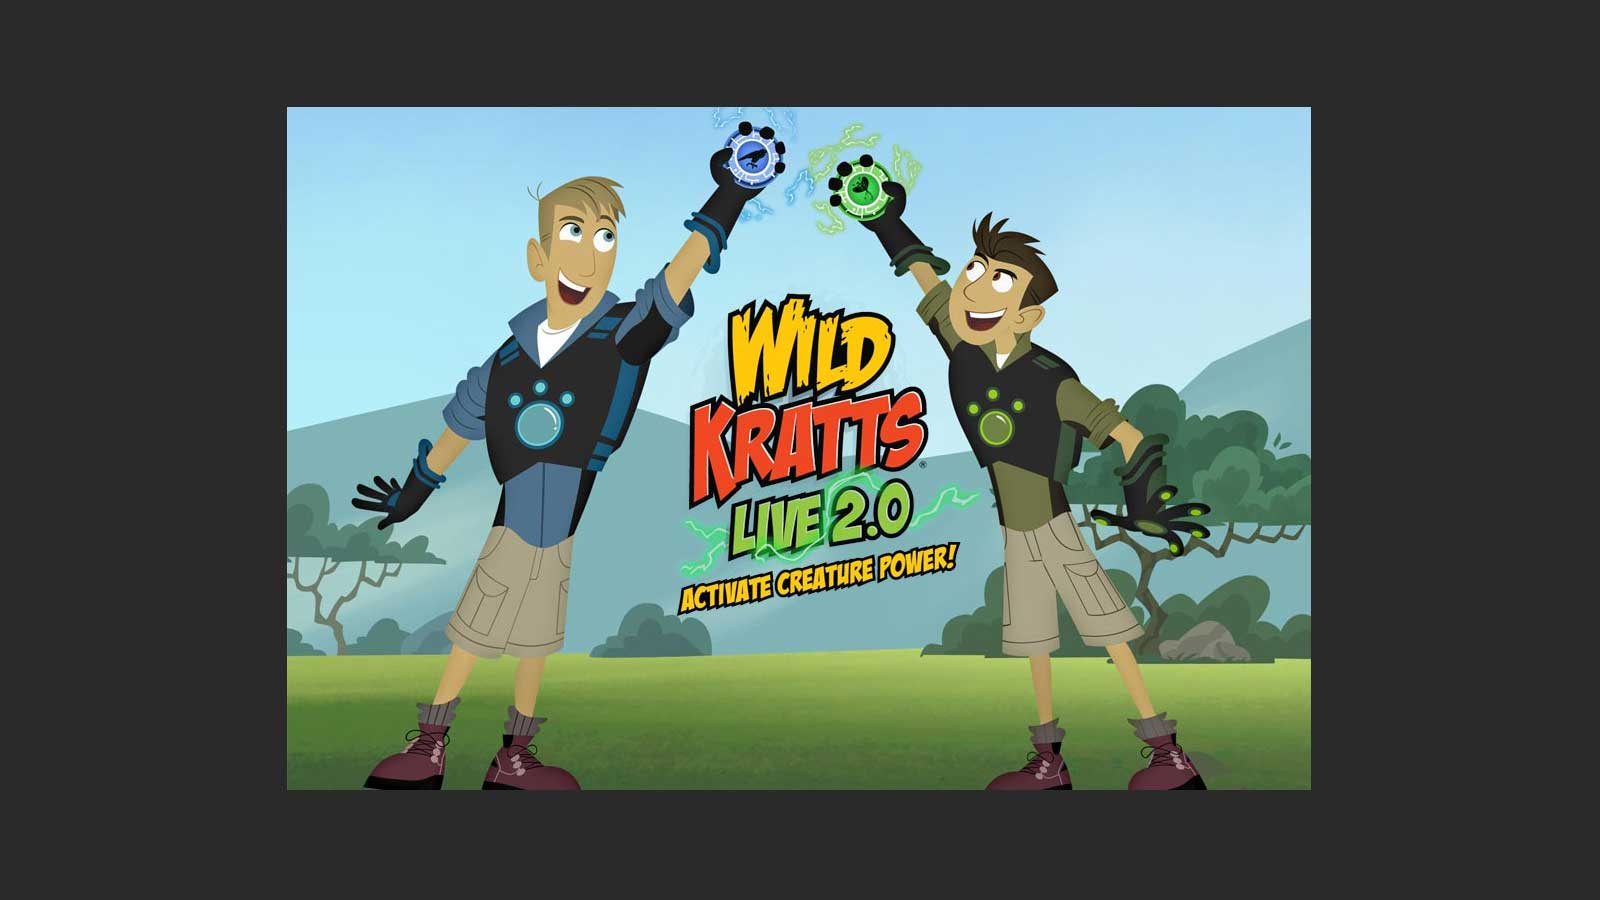 Wild Krats Live 2.0 Activate Creature Power